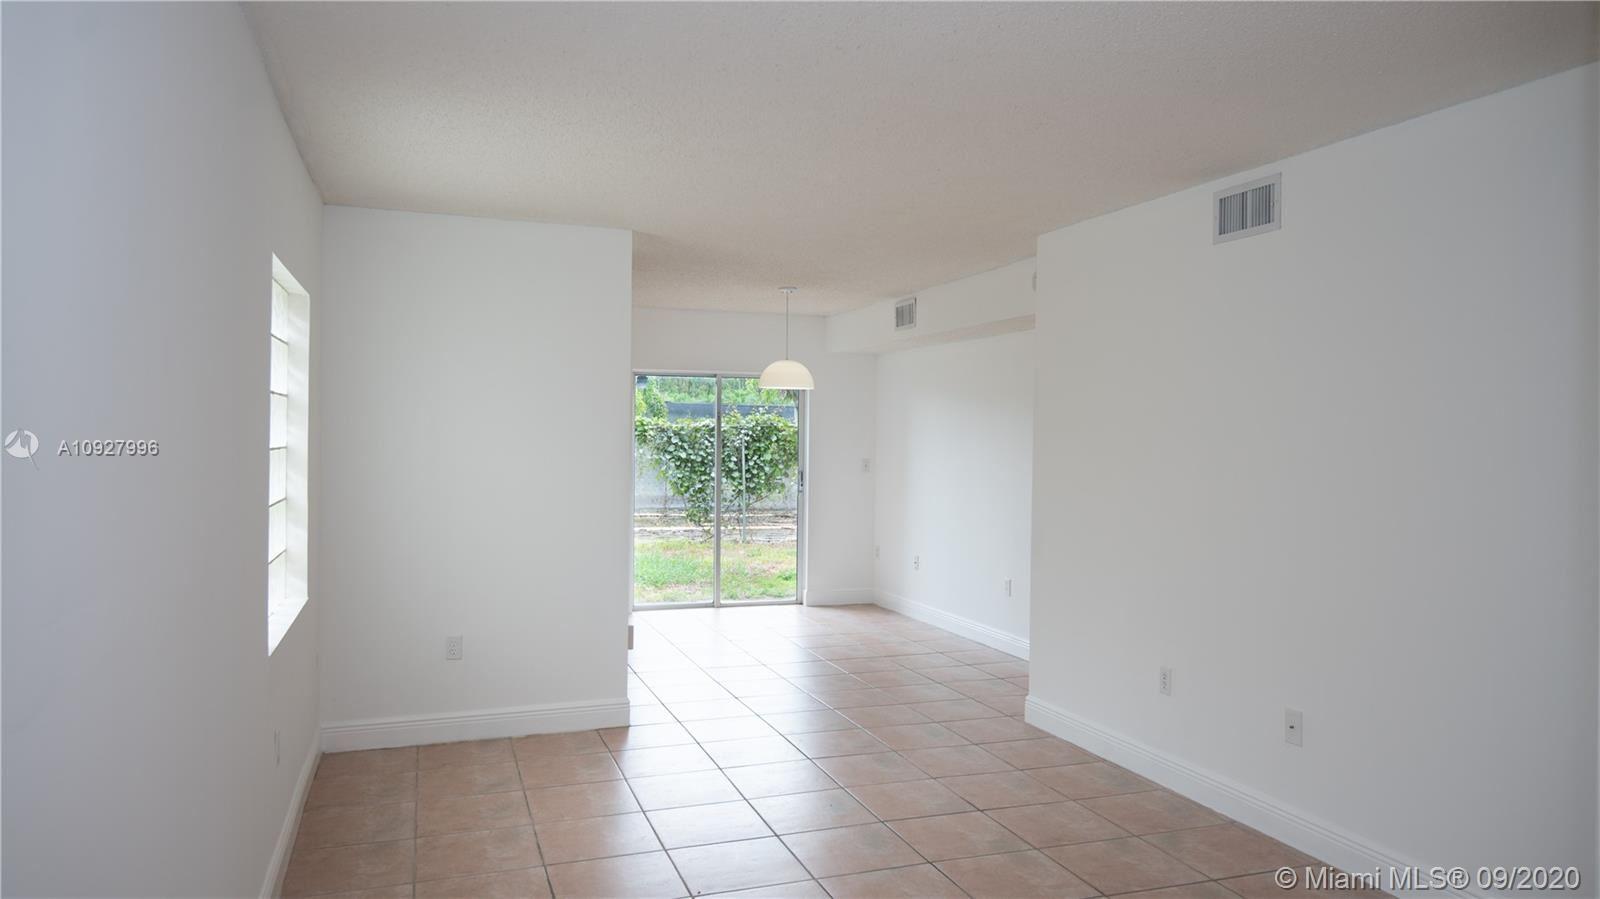 Photo of 13326 SW 152nd St #3307, Miami, FL 33177 (MLS # A10927996)